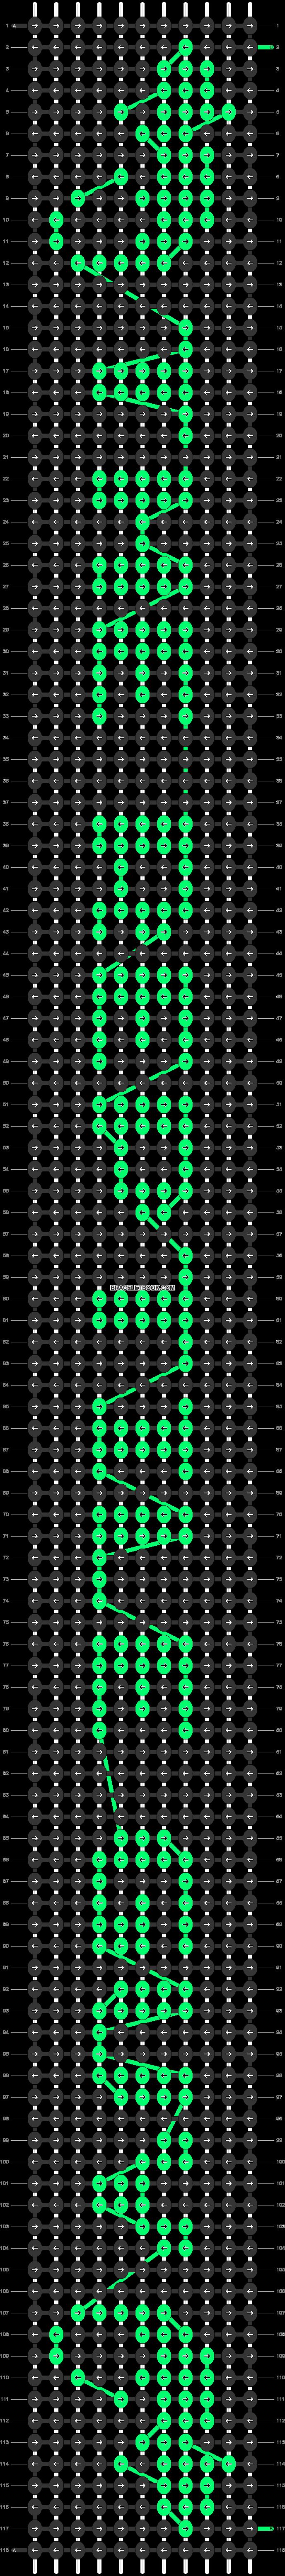 Alpha pattern #19765 pattern